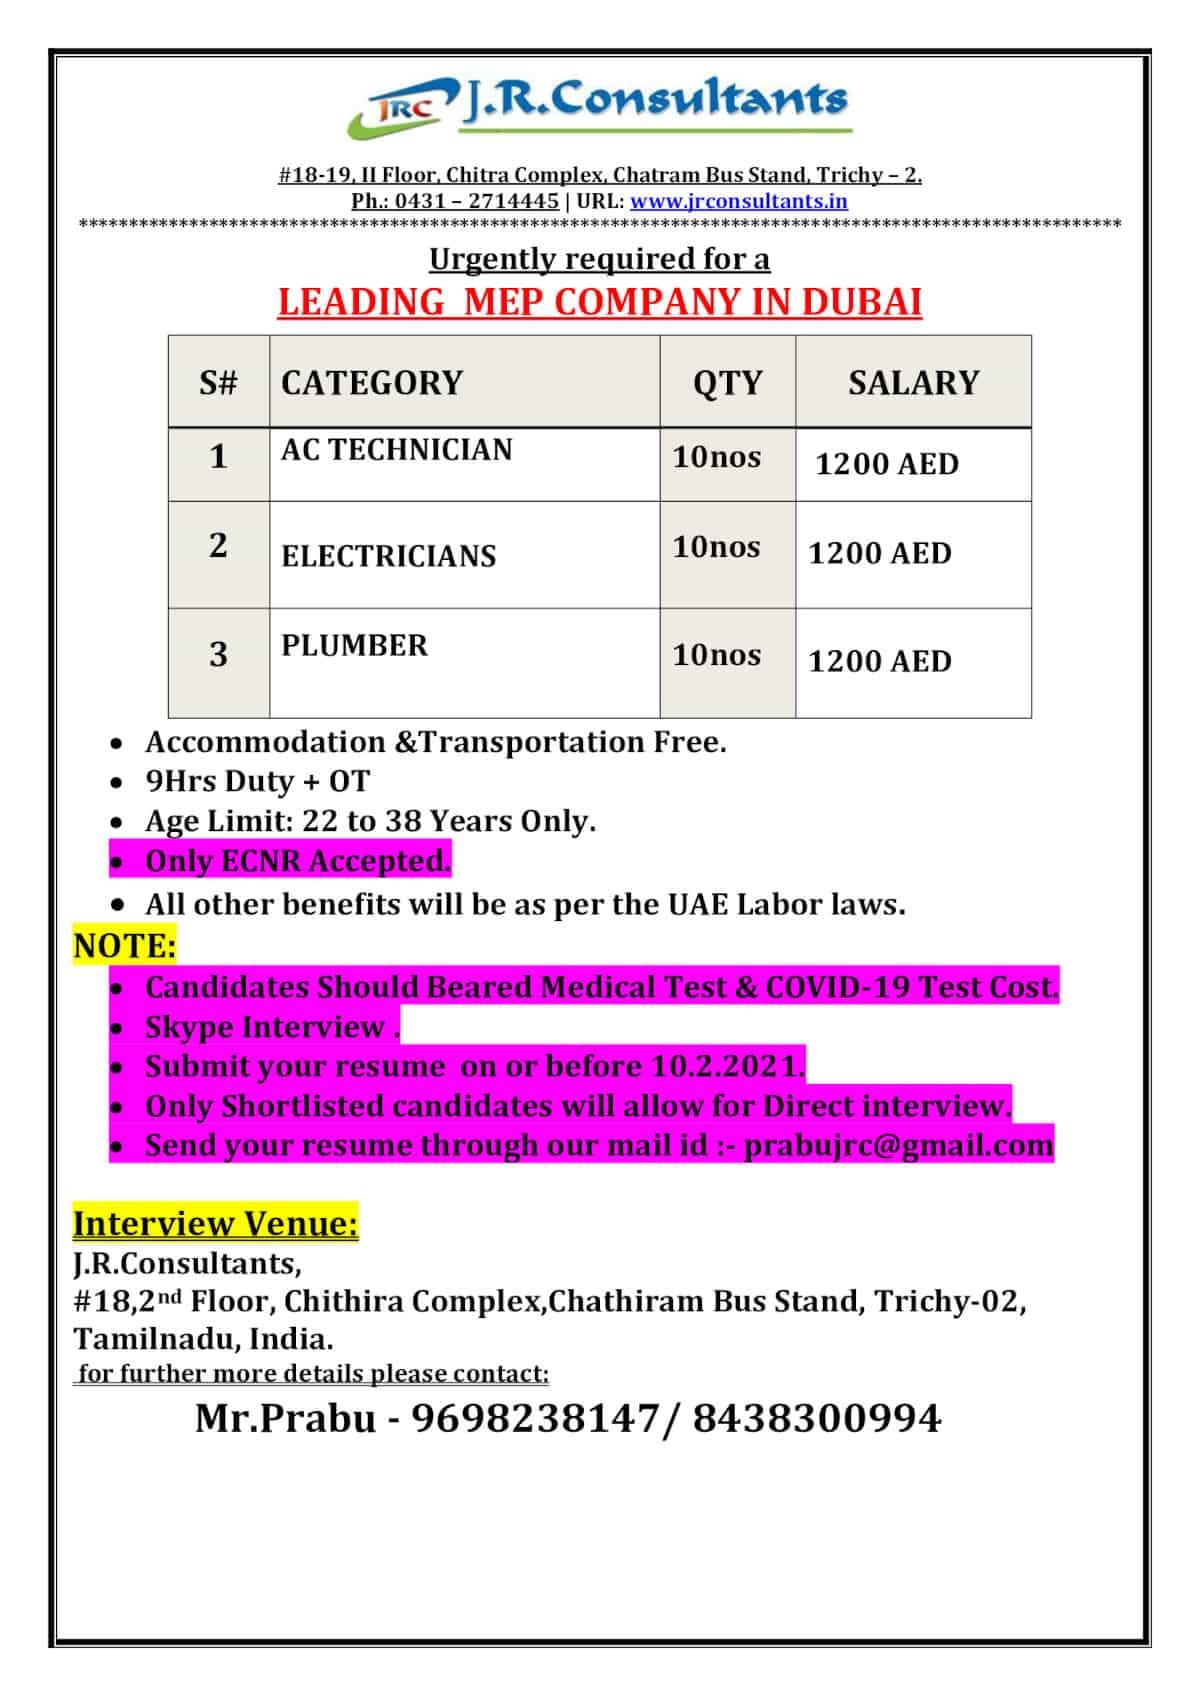 Gulf jobs Dubai – Required for a leading MEP company in Dubai